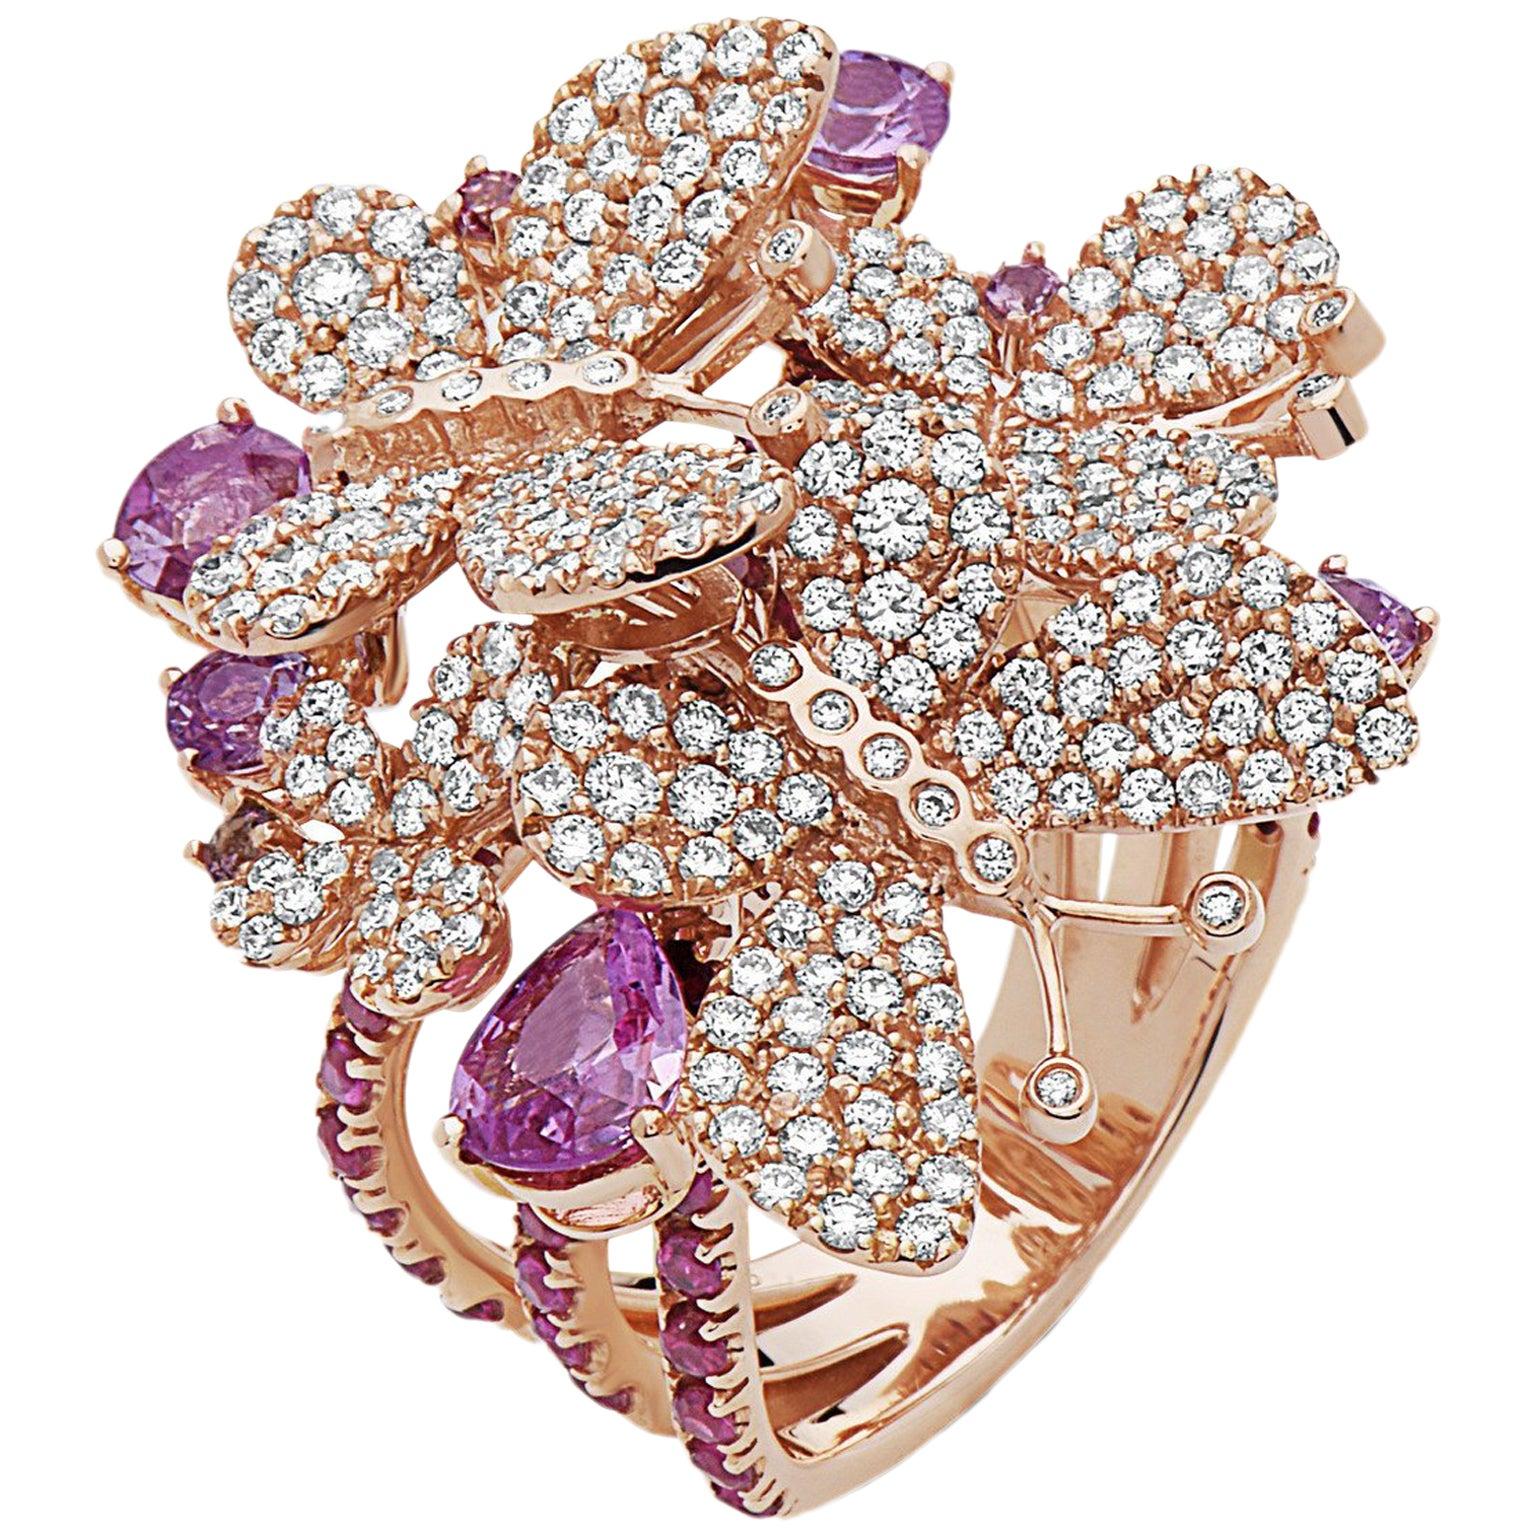 Emilio Jewelry Micro Pave Butterflies of Madagascar Diamond Ring